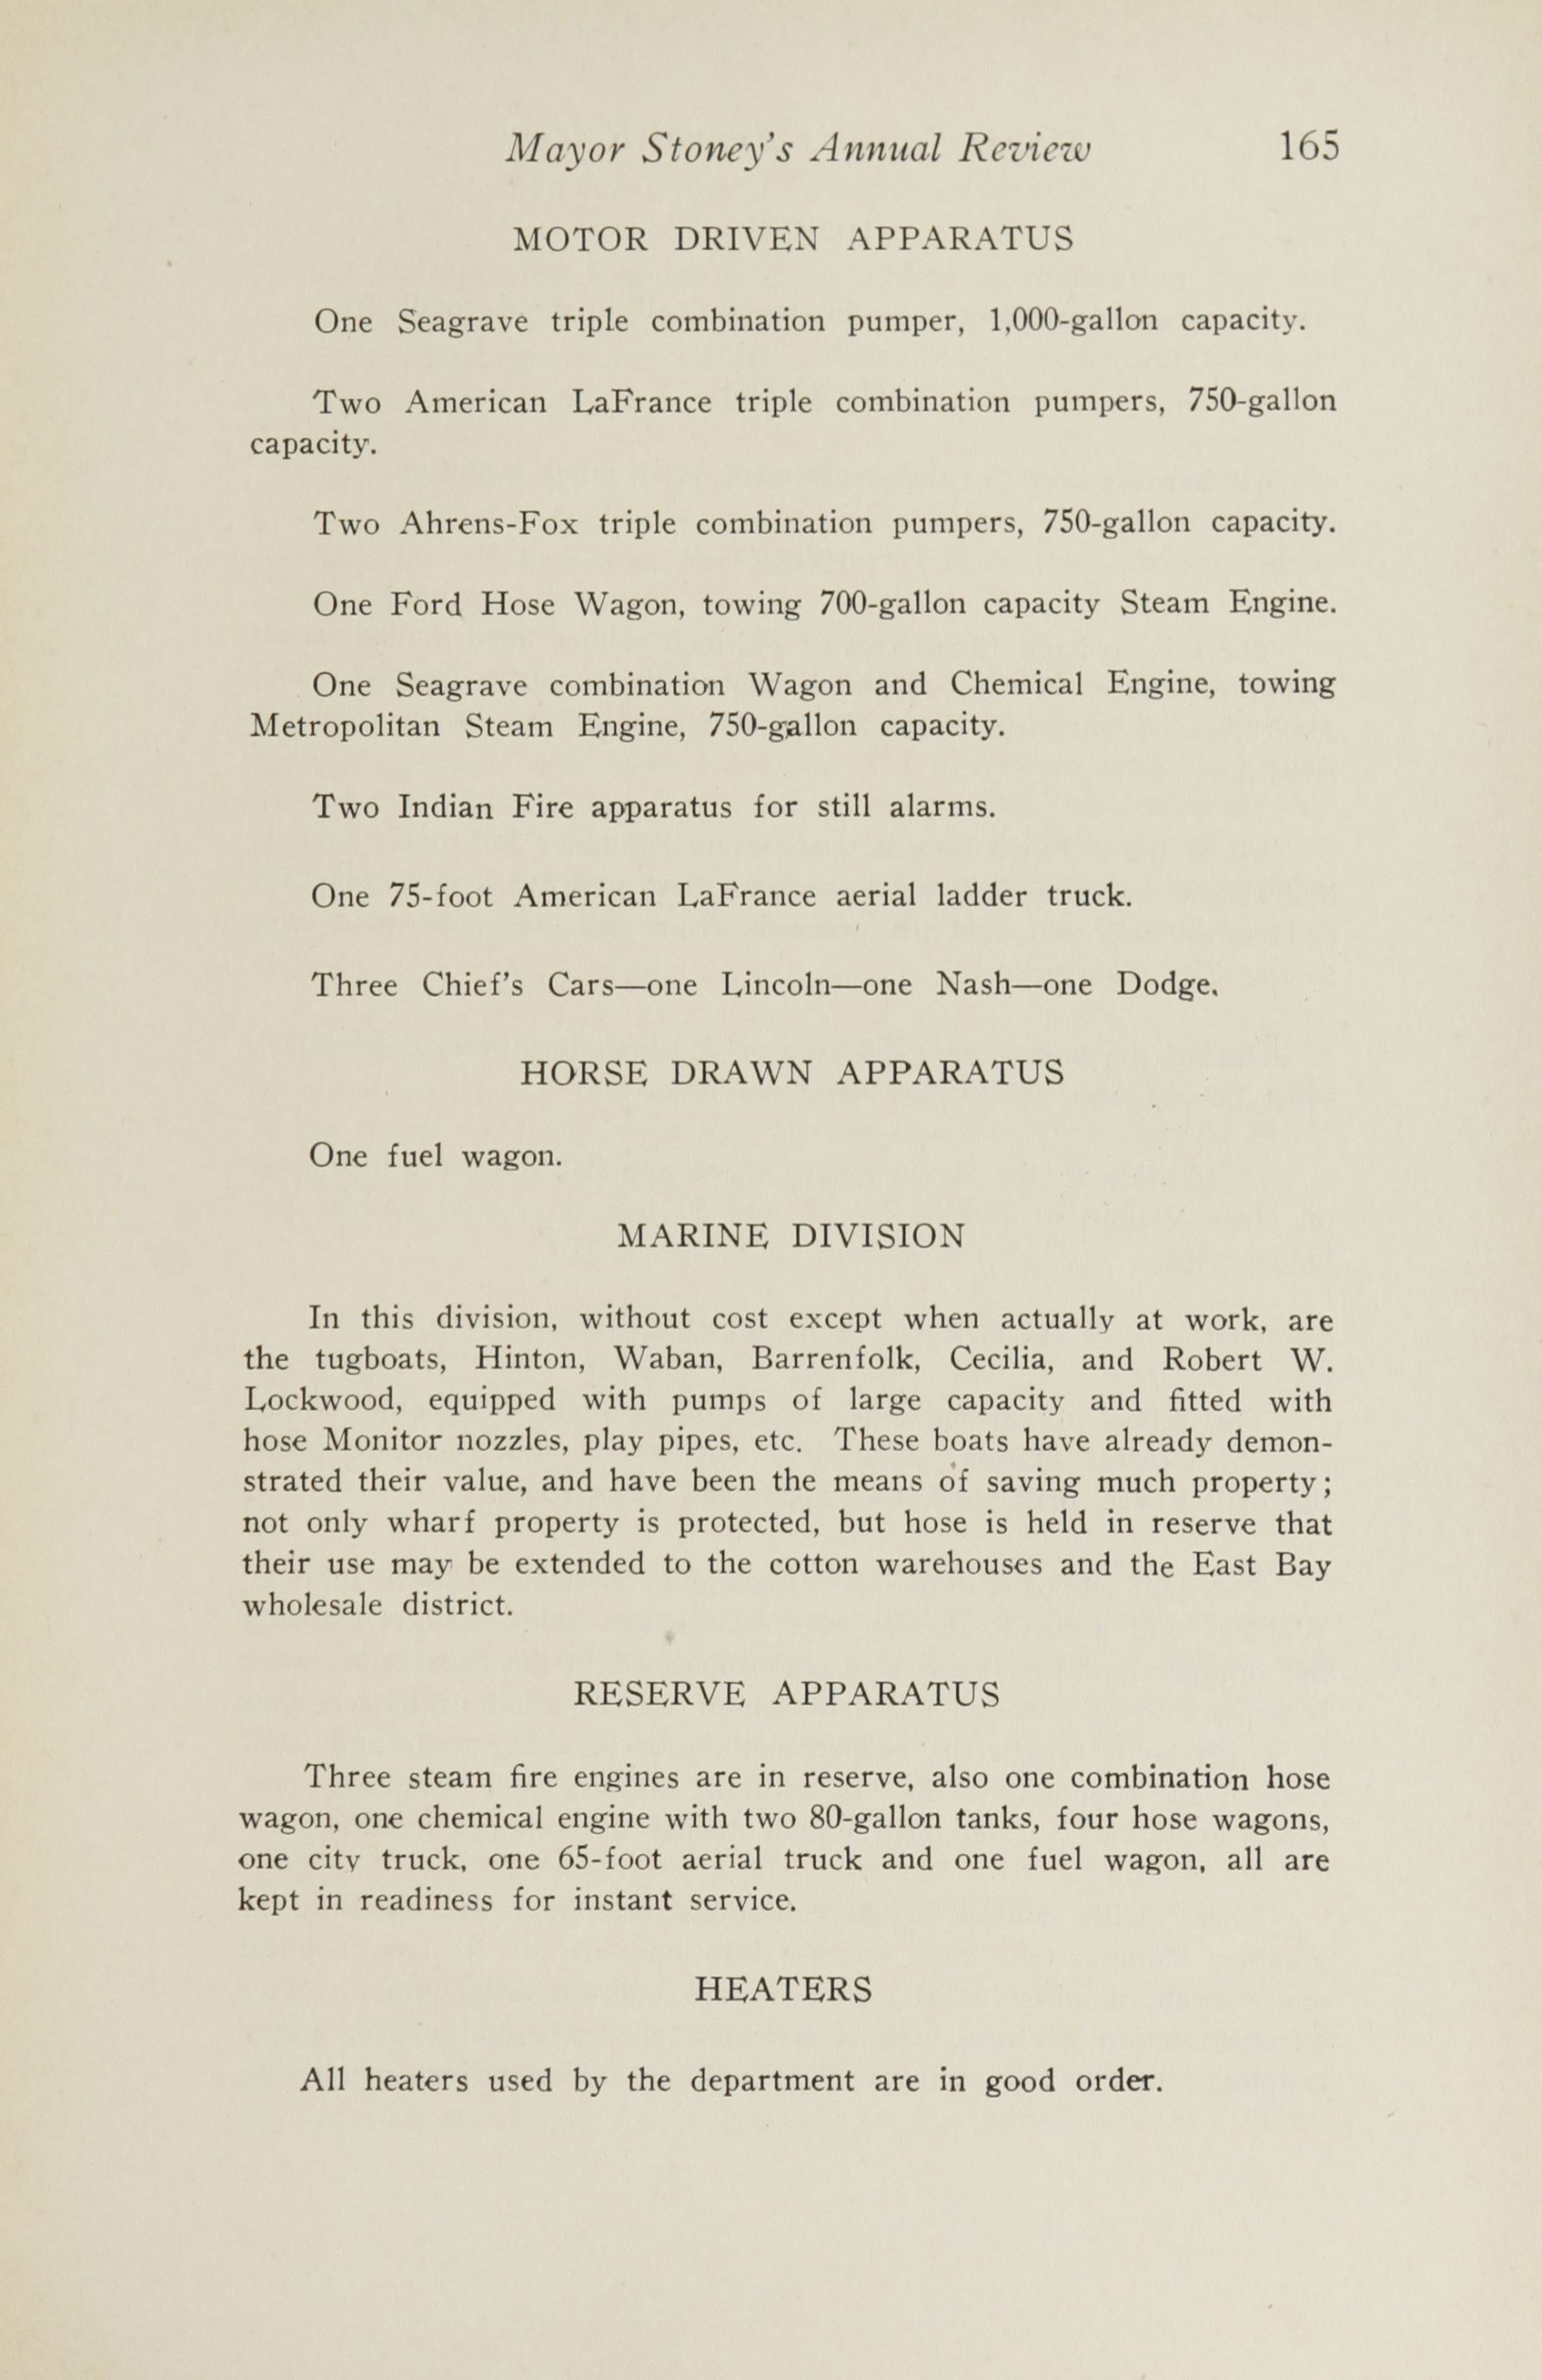 Charleston Yearbook, 1929, page 165